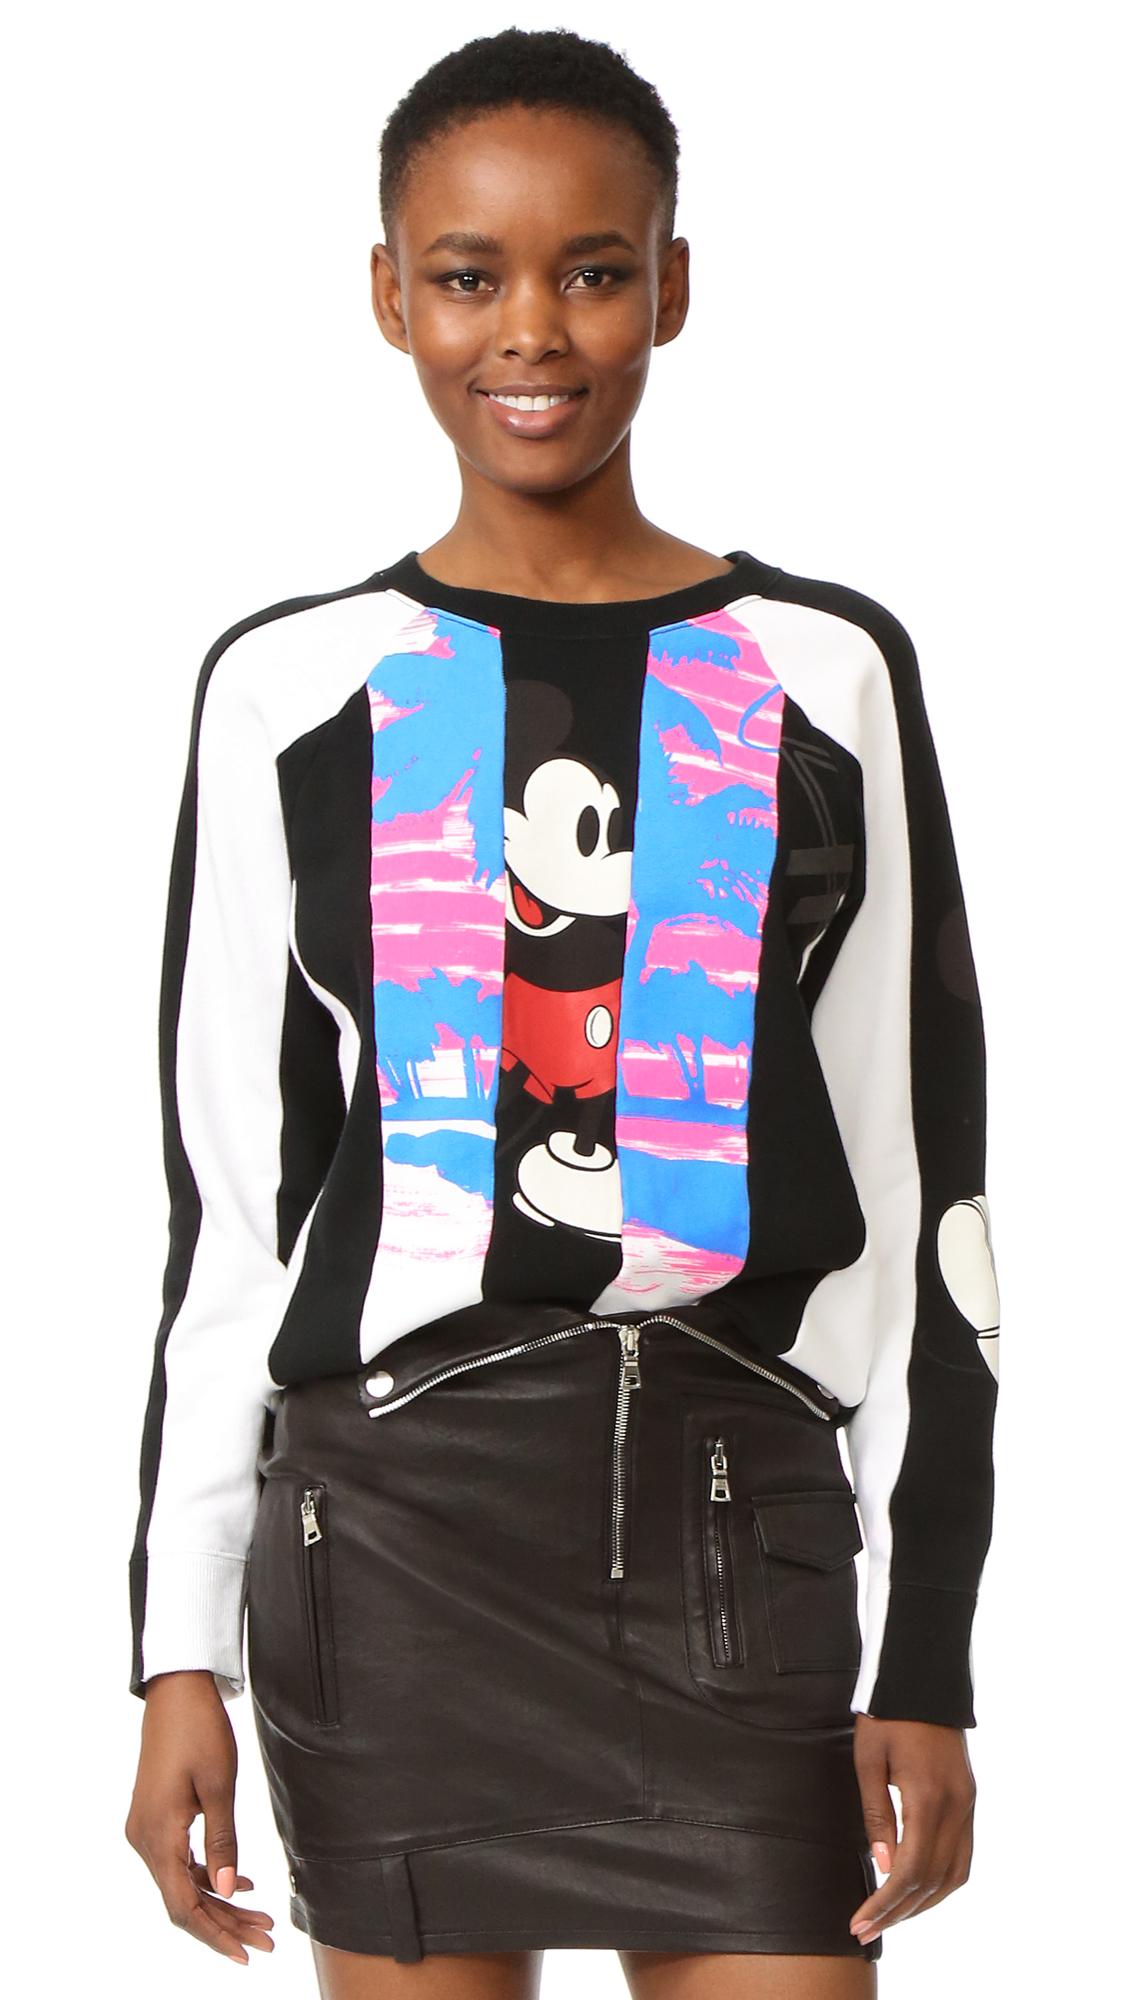 marc jacobs female marc jacobs long sleeve raglan sweatshirt black multi